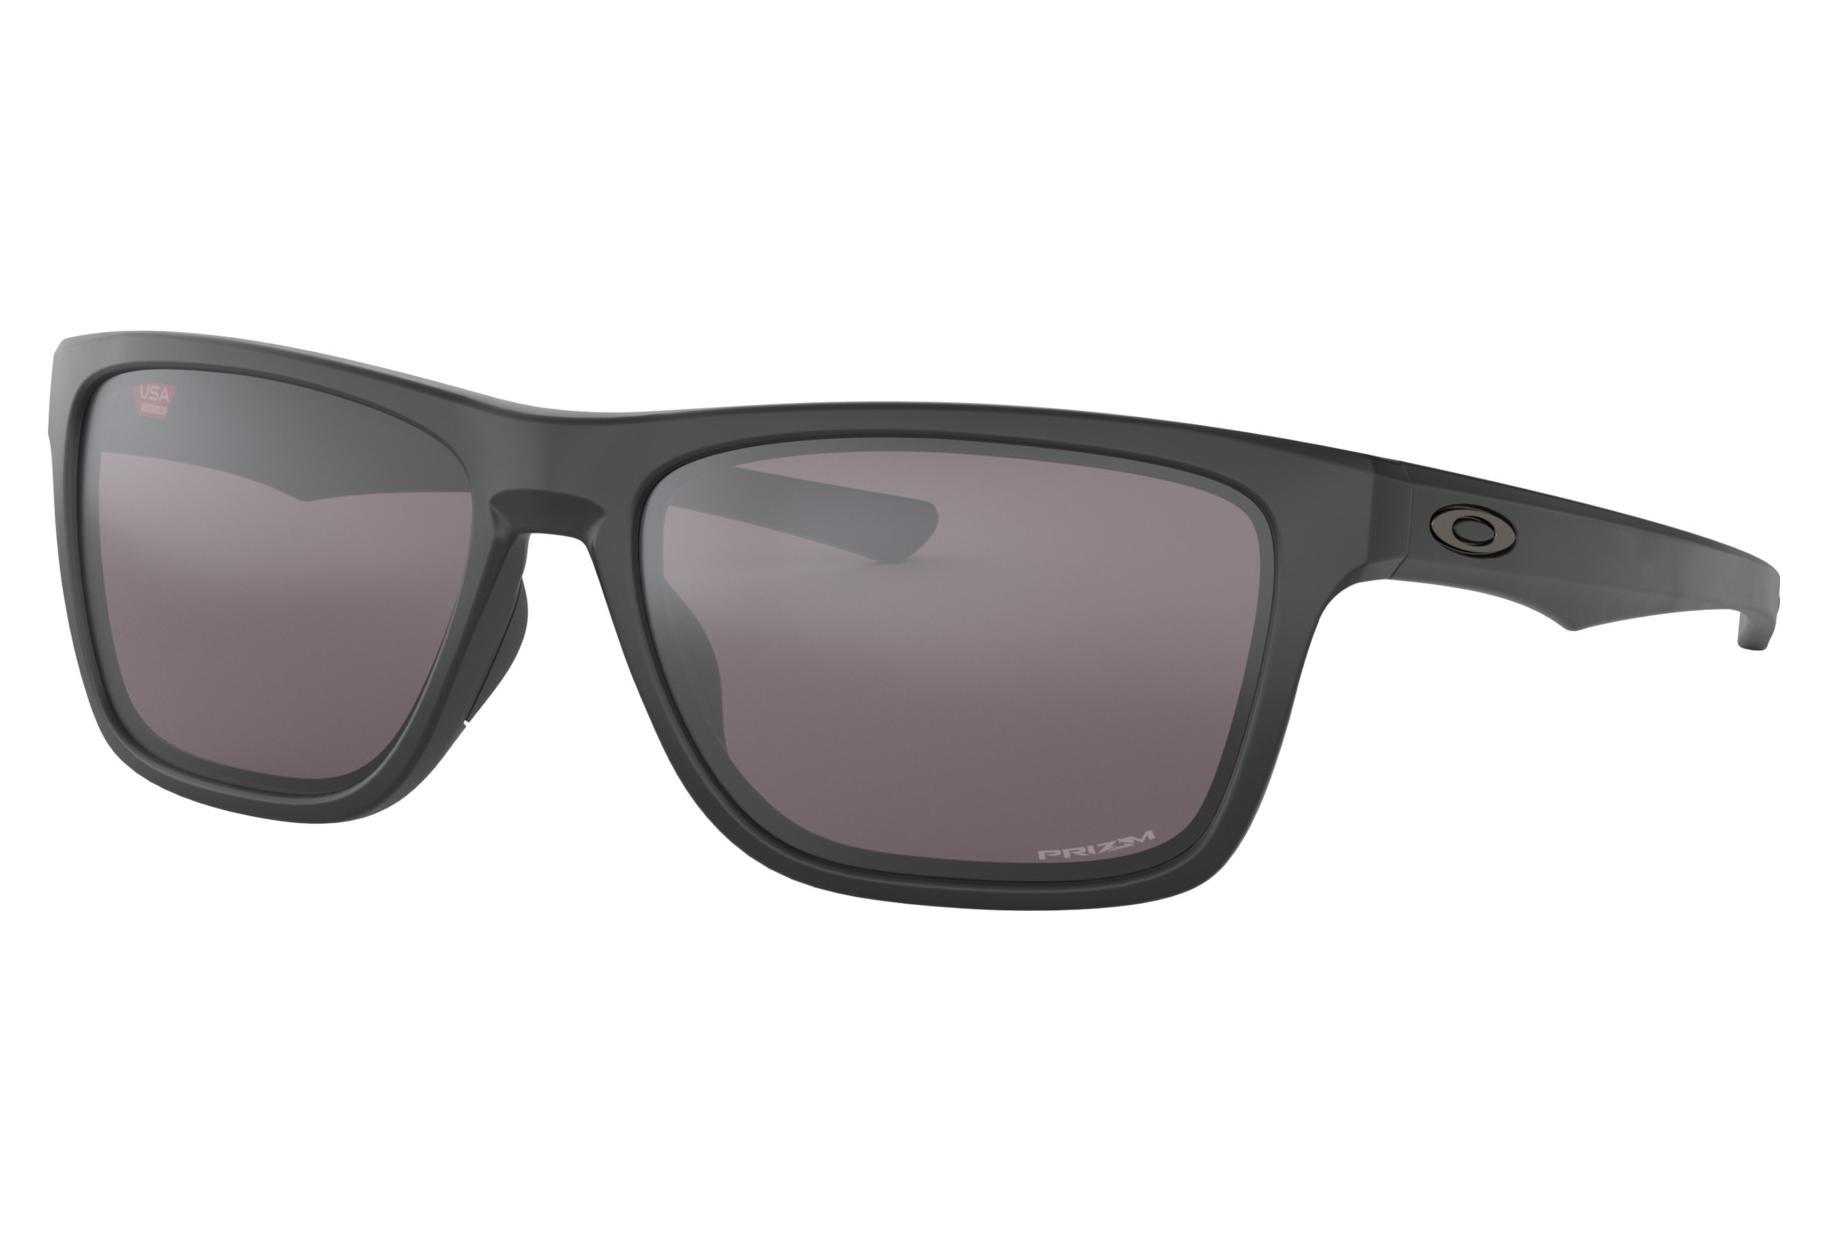 38df0e90ae Gafas de sol OAKLEY HOLSTON Matt Black / Prizm Gray Ref OO9334-0858 ...